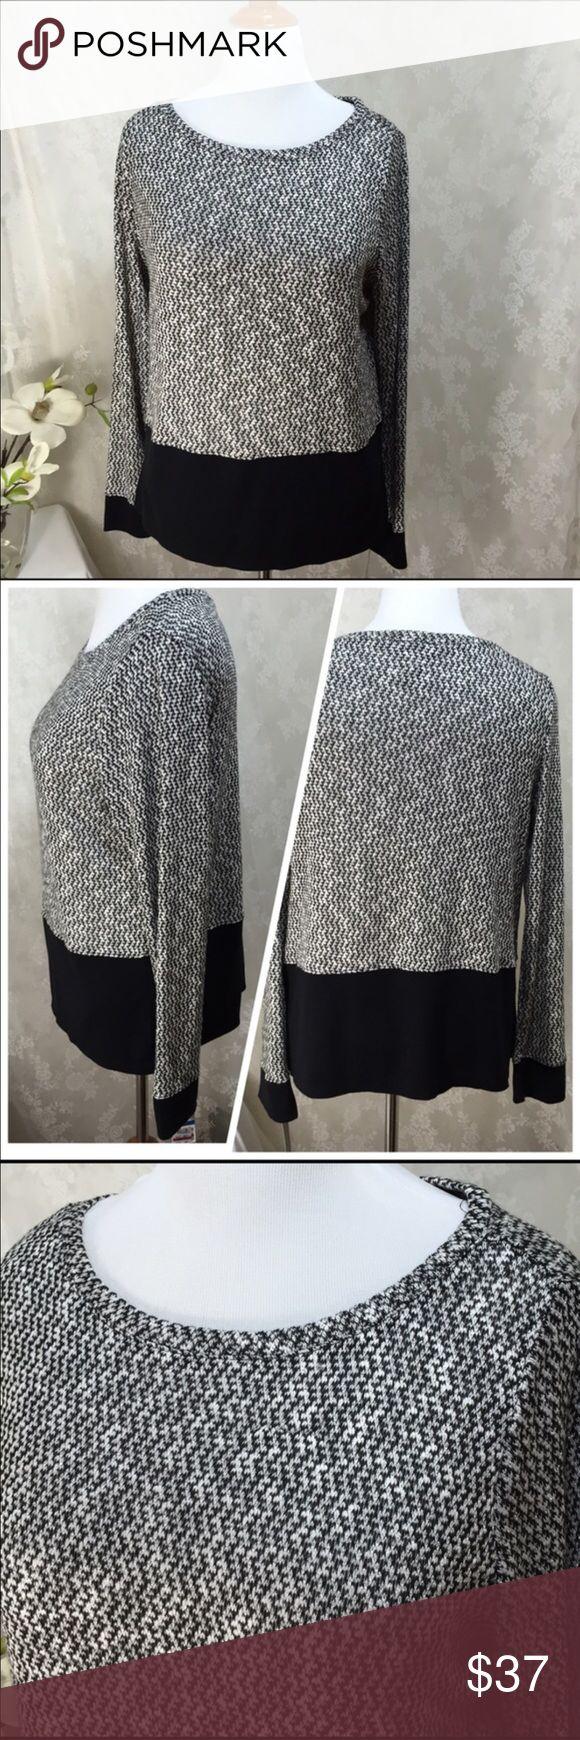 "INC black and white long sleeve blouse. B019 Inc black and white long sleeve blouse. 23"" across armpit to armpit 25"" long. Lightweight. Inc black and white long sleeve blouse. B019 INC International Concepts Sweaters"